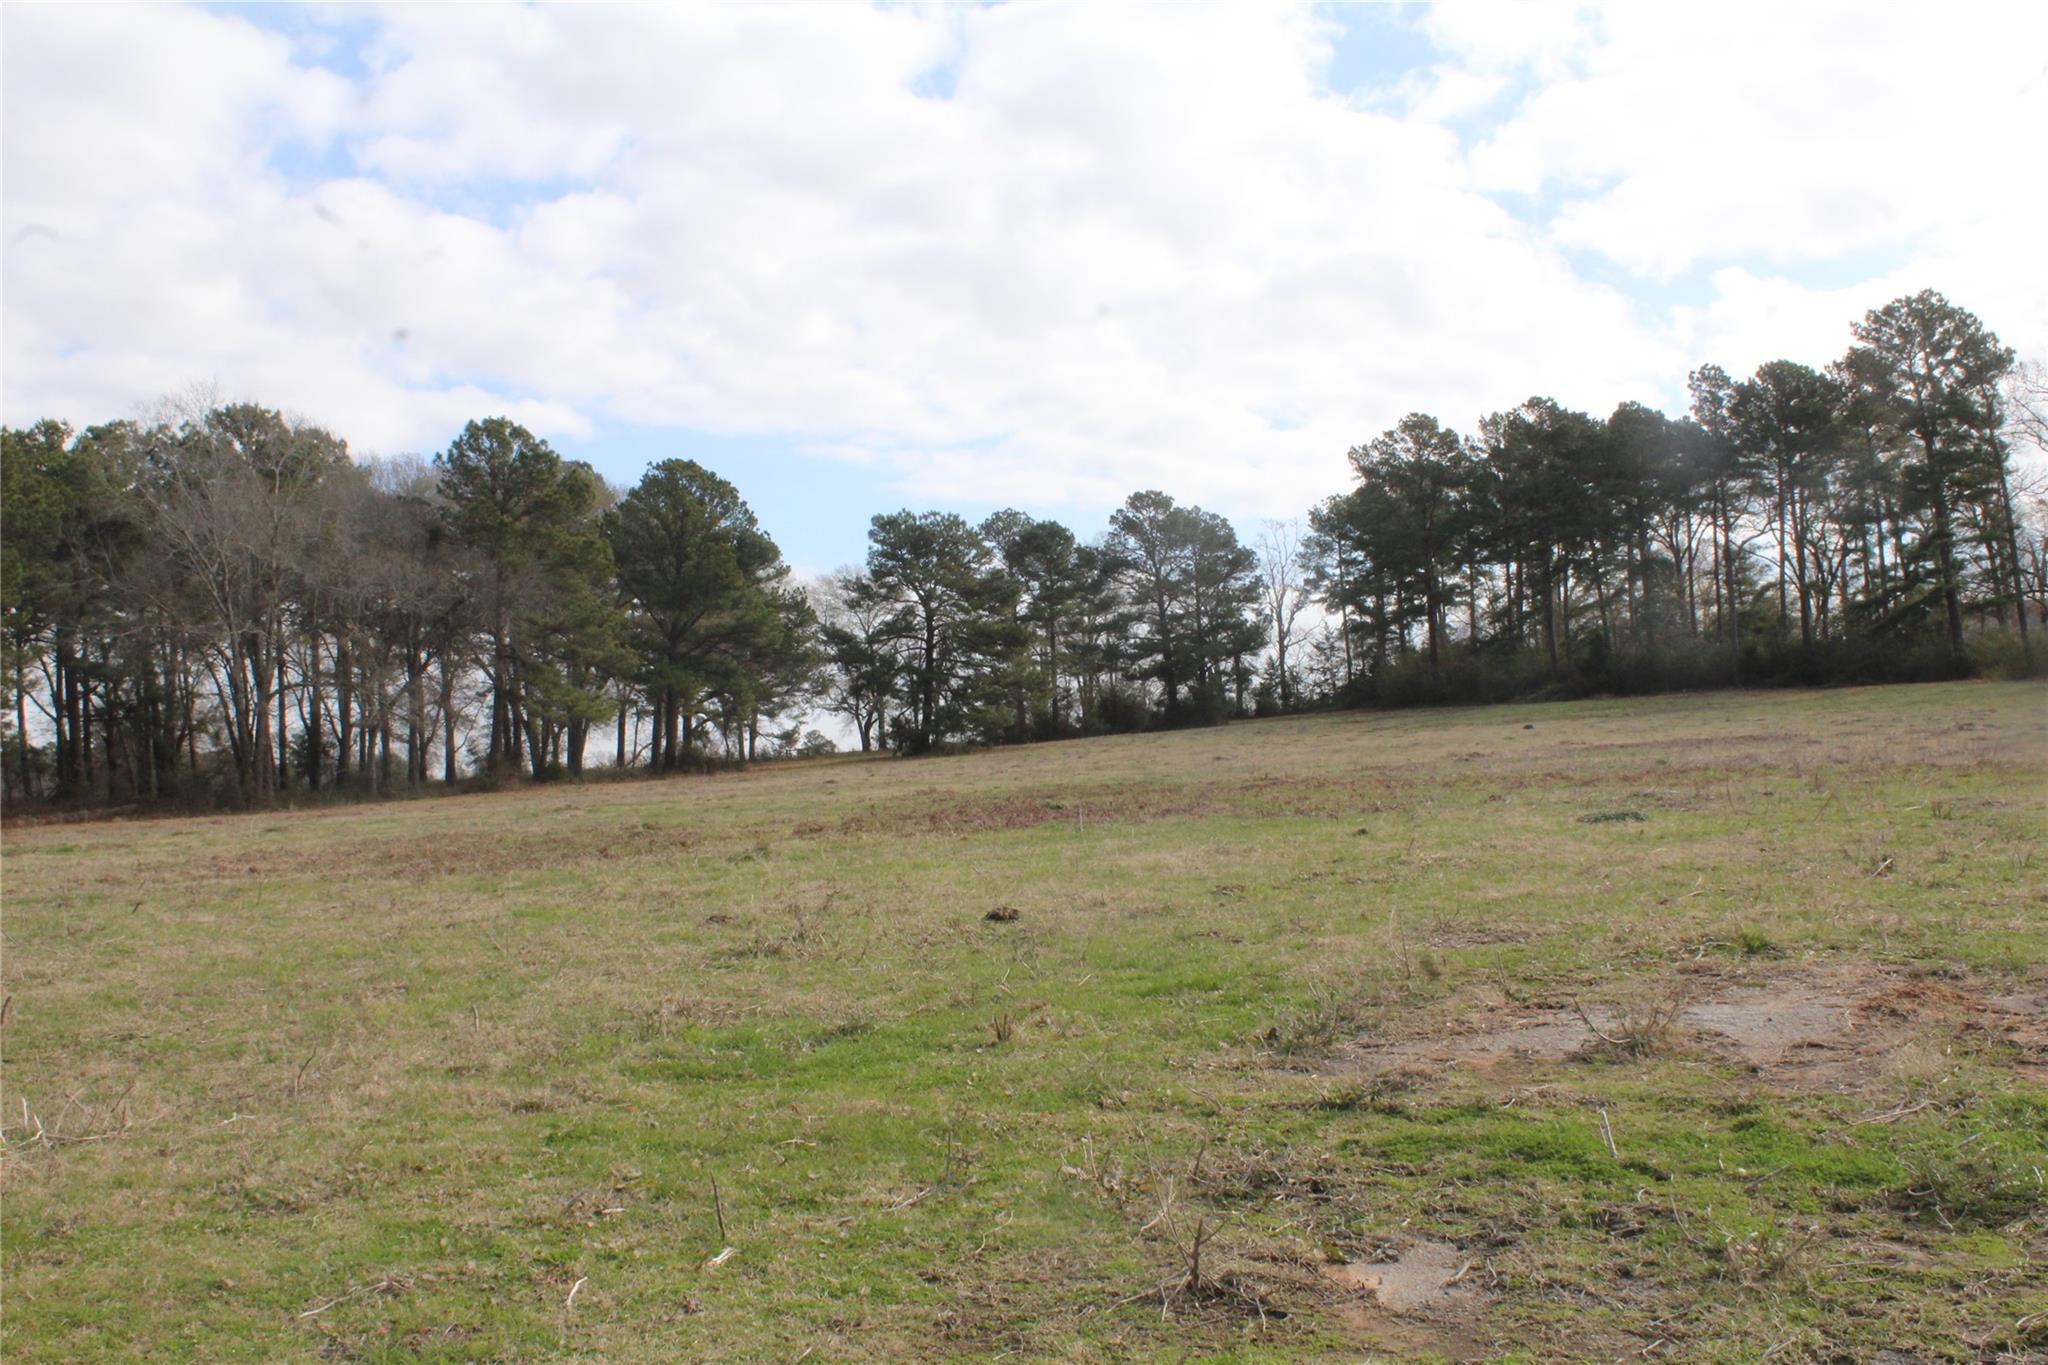 TBD NE Loop 304 Property Photo - Crockett, TX real estate listing